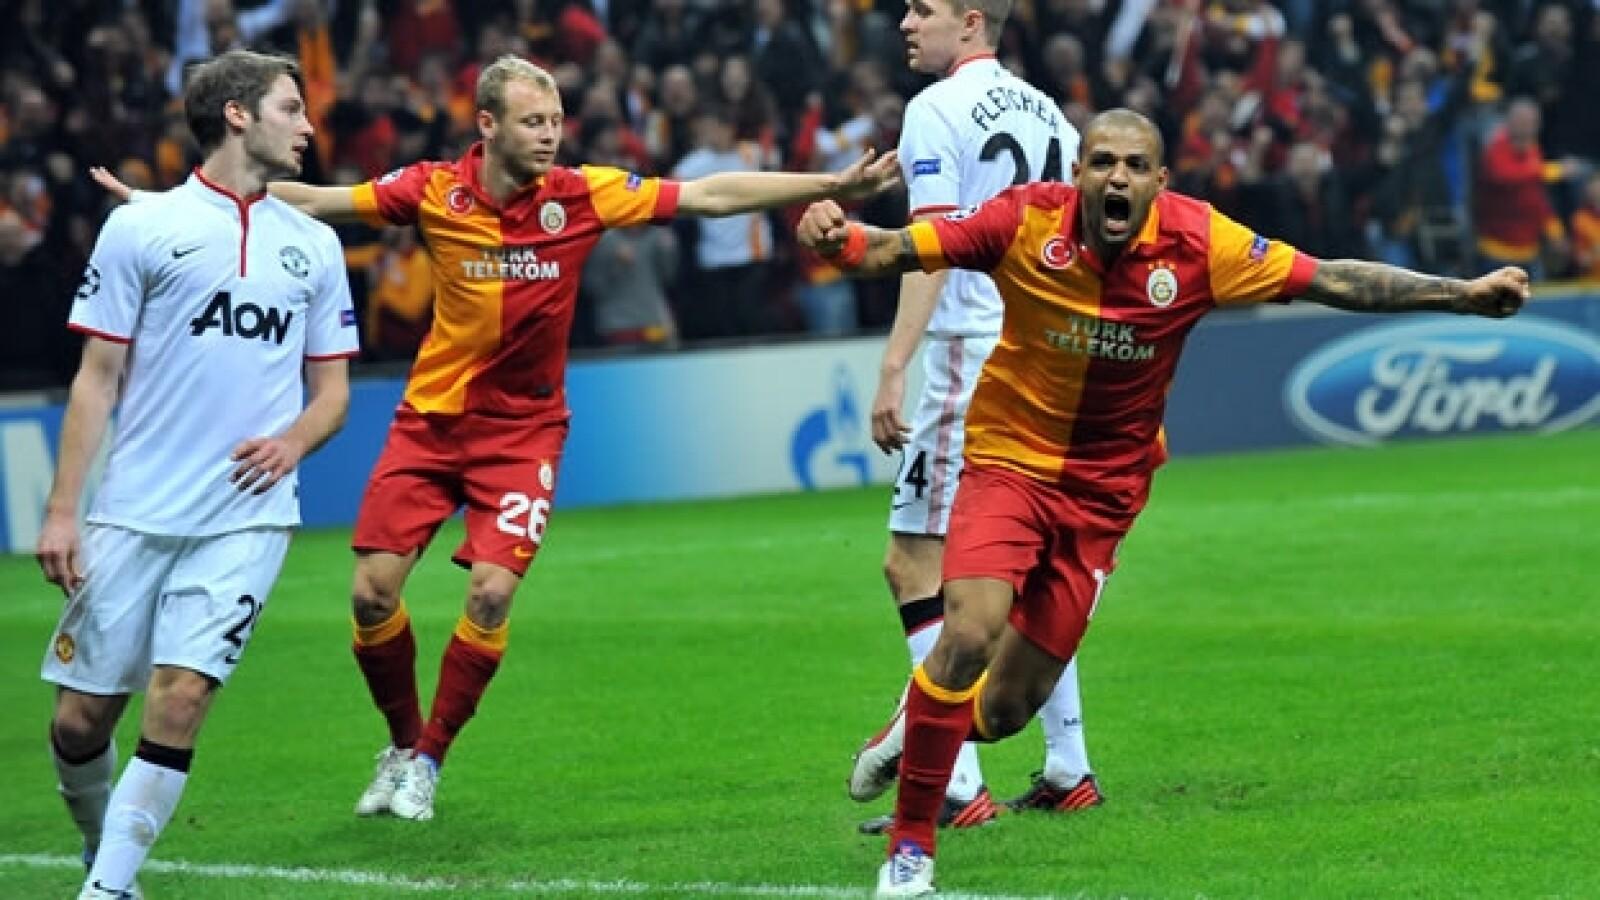 Manchester United pierde ante el Galatasaray